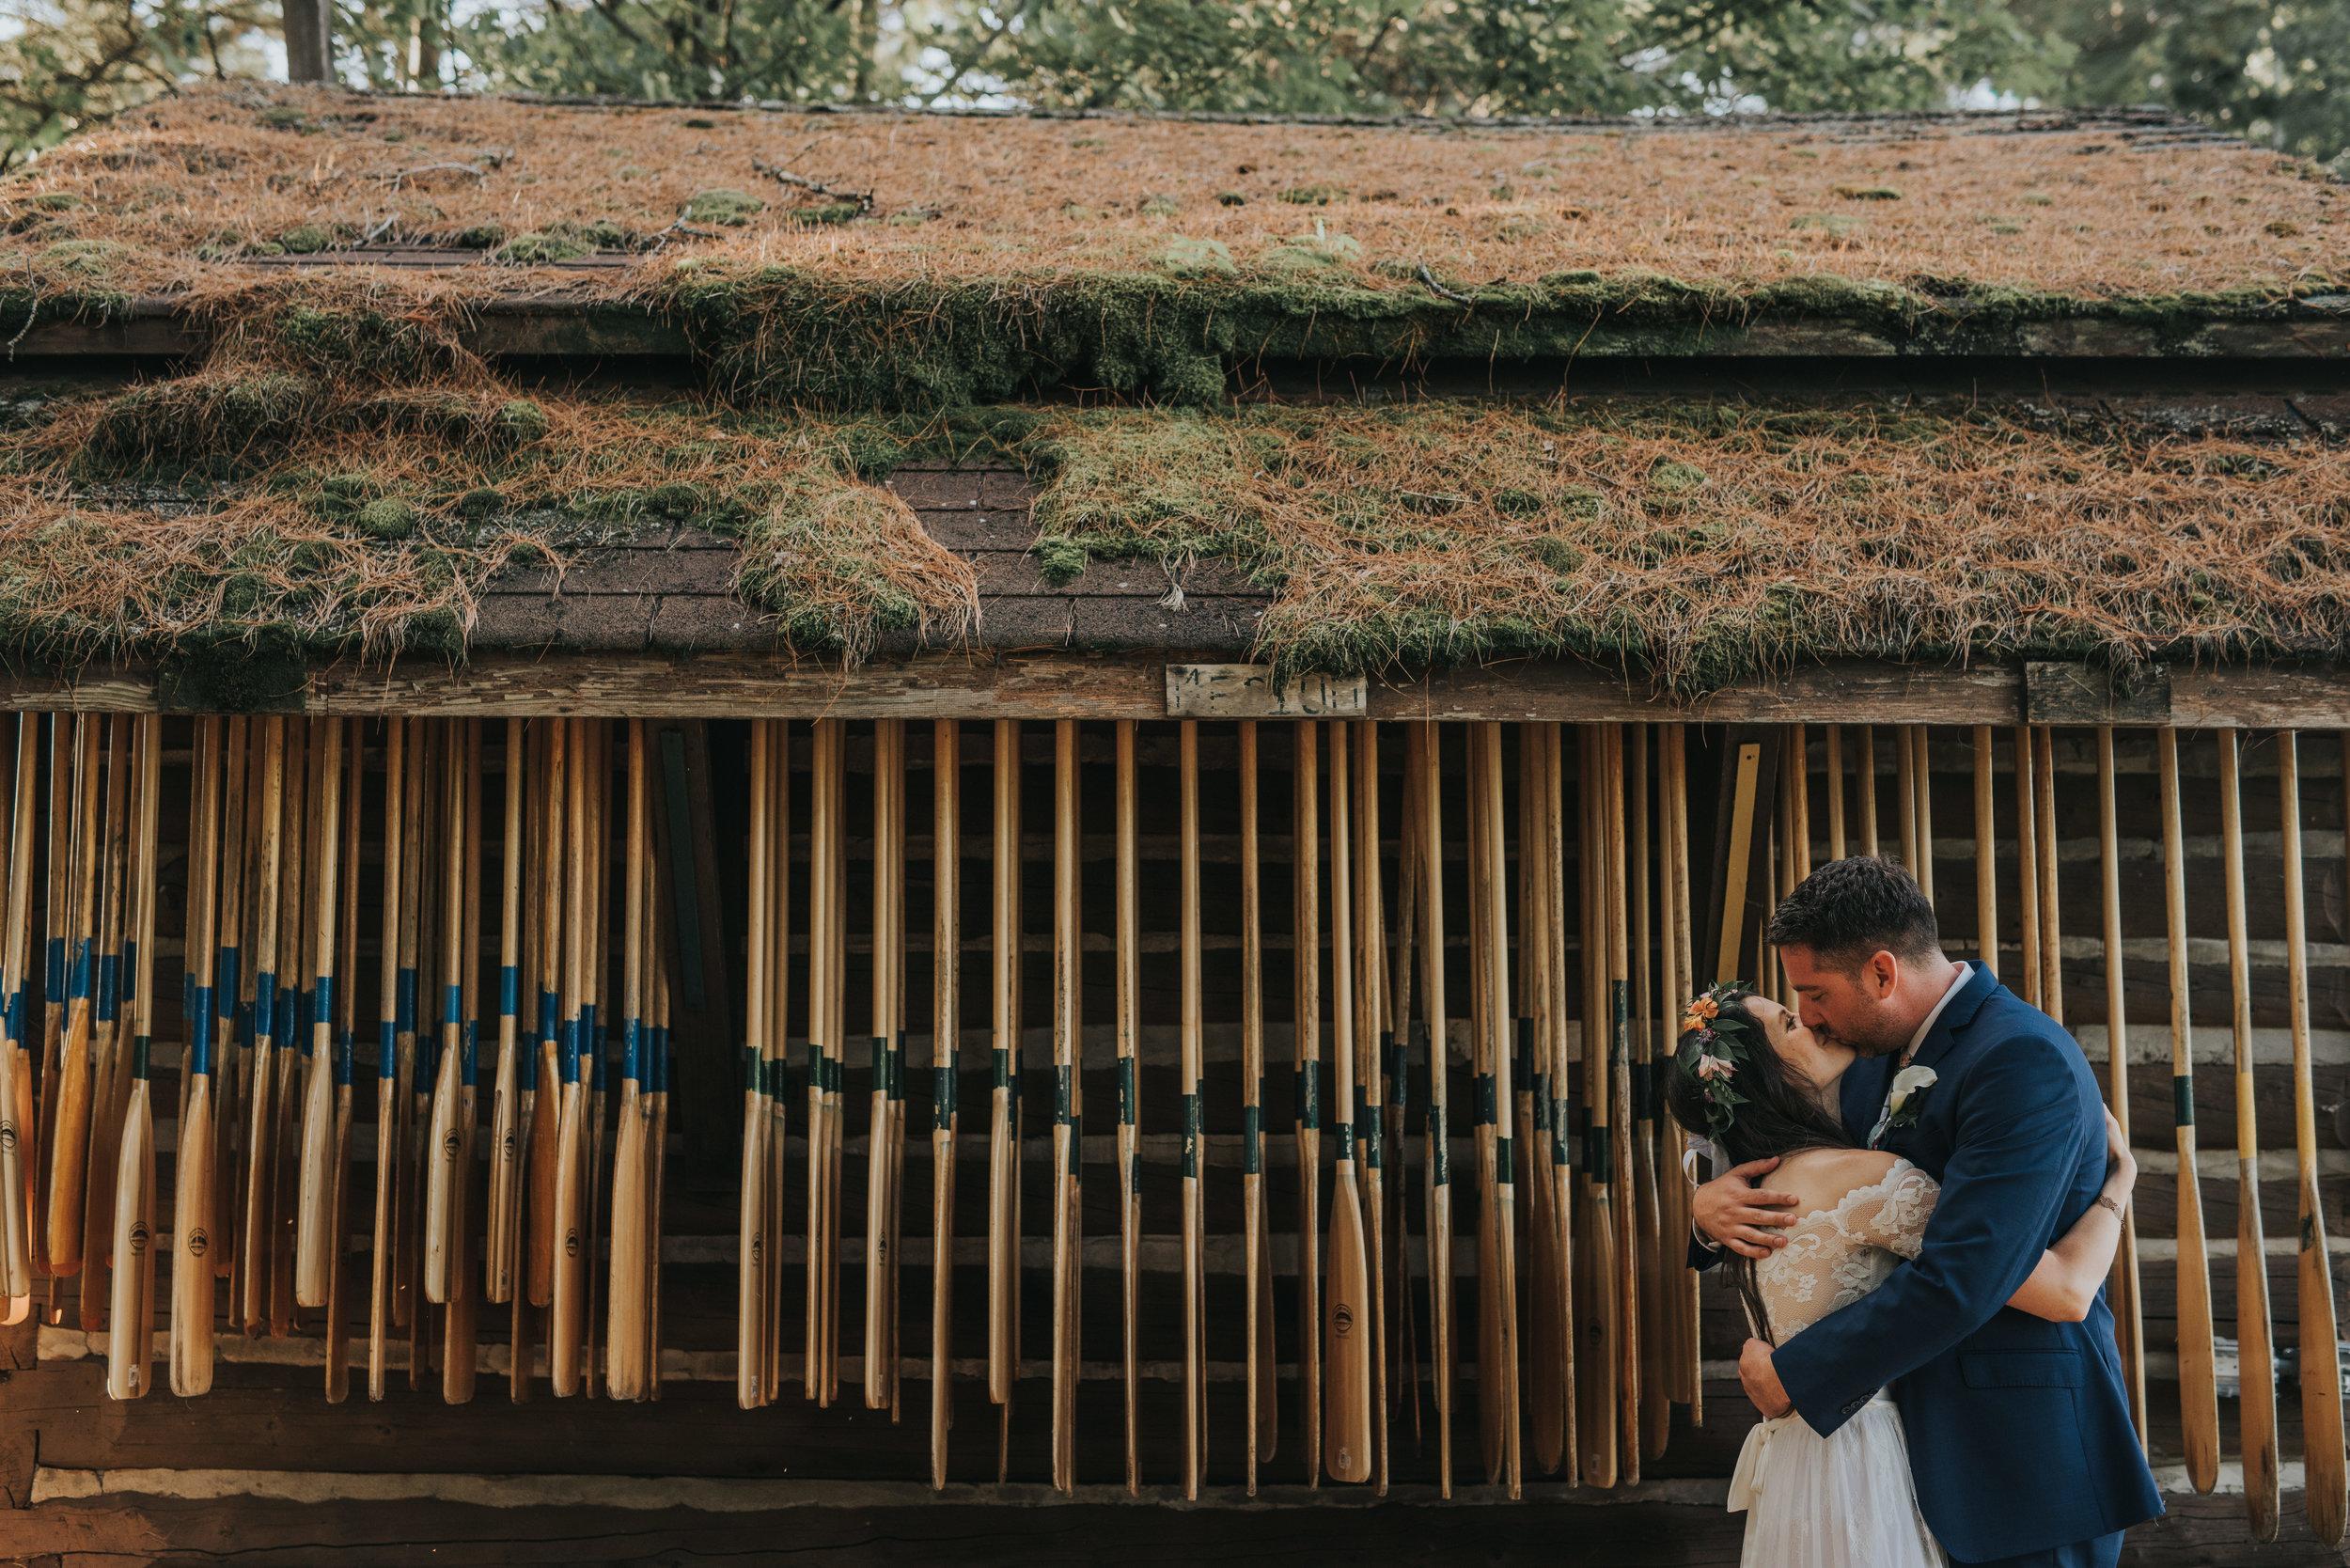 bride-groom-kissing-rustic-cabin-wedding-toronto-bohemian-boho-outdoor-summer-wedding-documentary-wedding-photography-by-willow-birch-photo.jpg